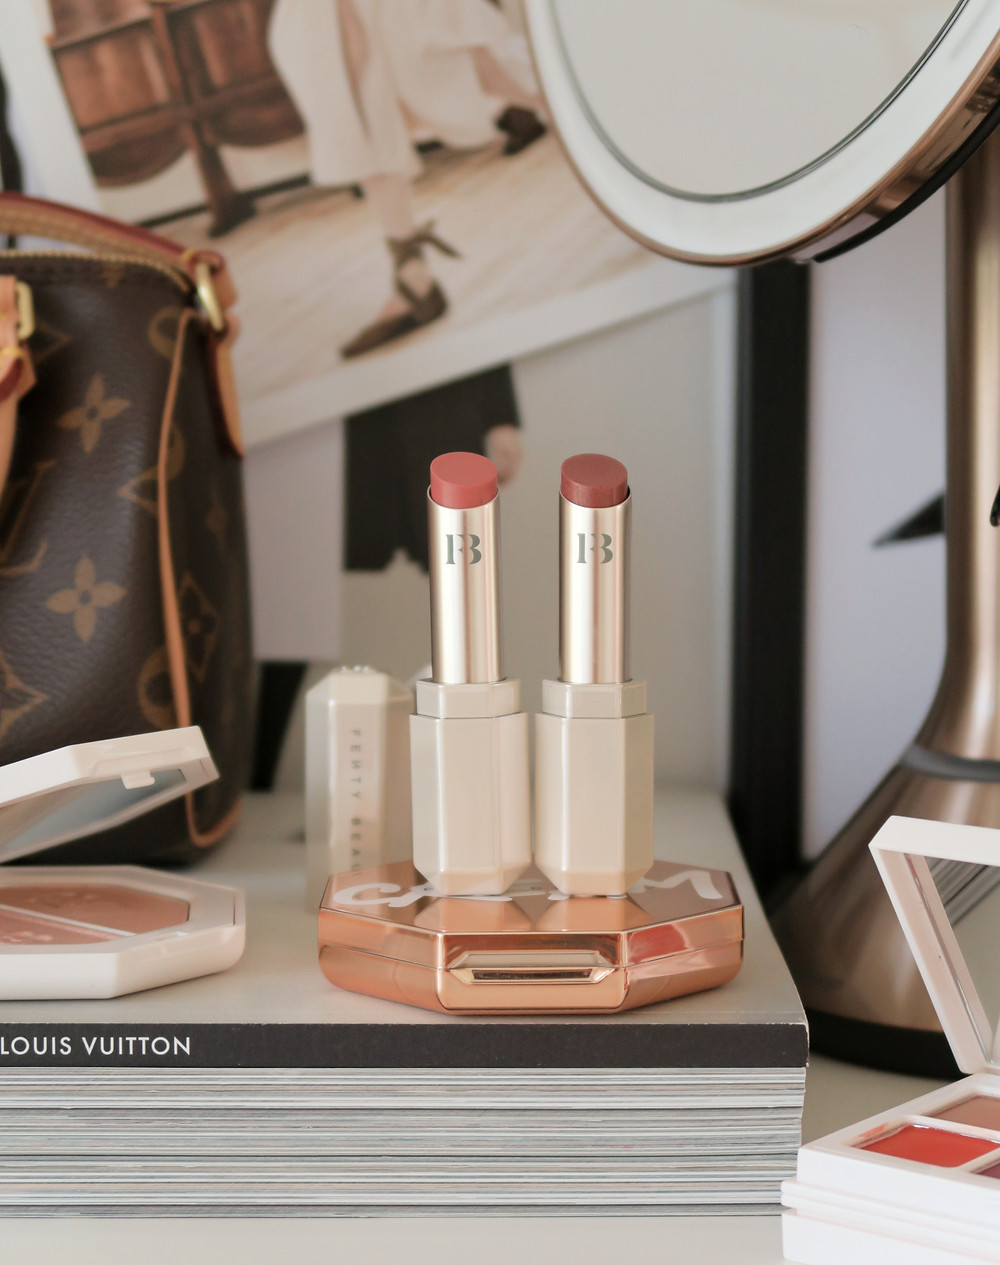 fenty beauty slip shine sheer shiny lipstick review